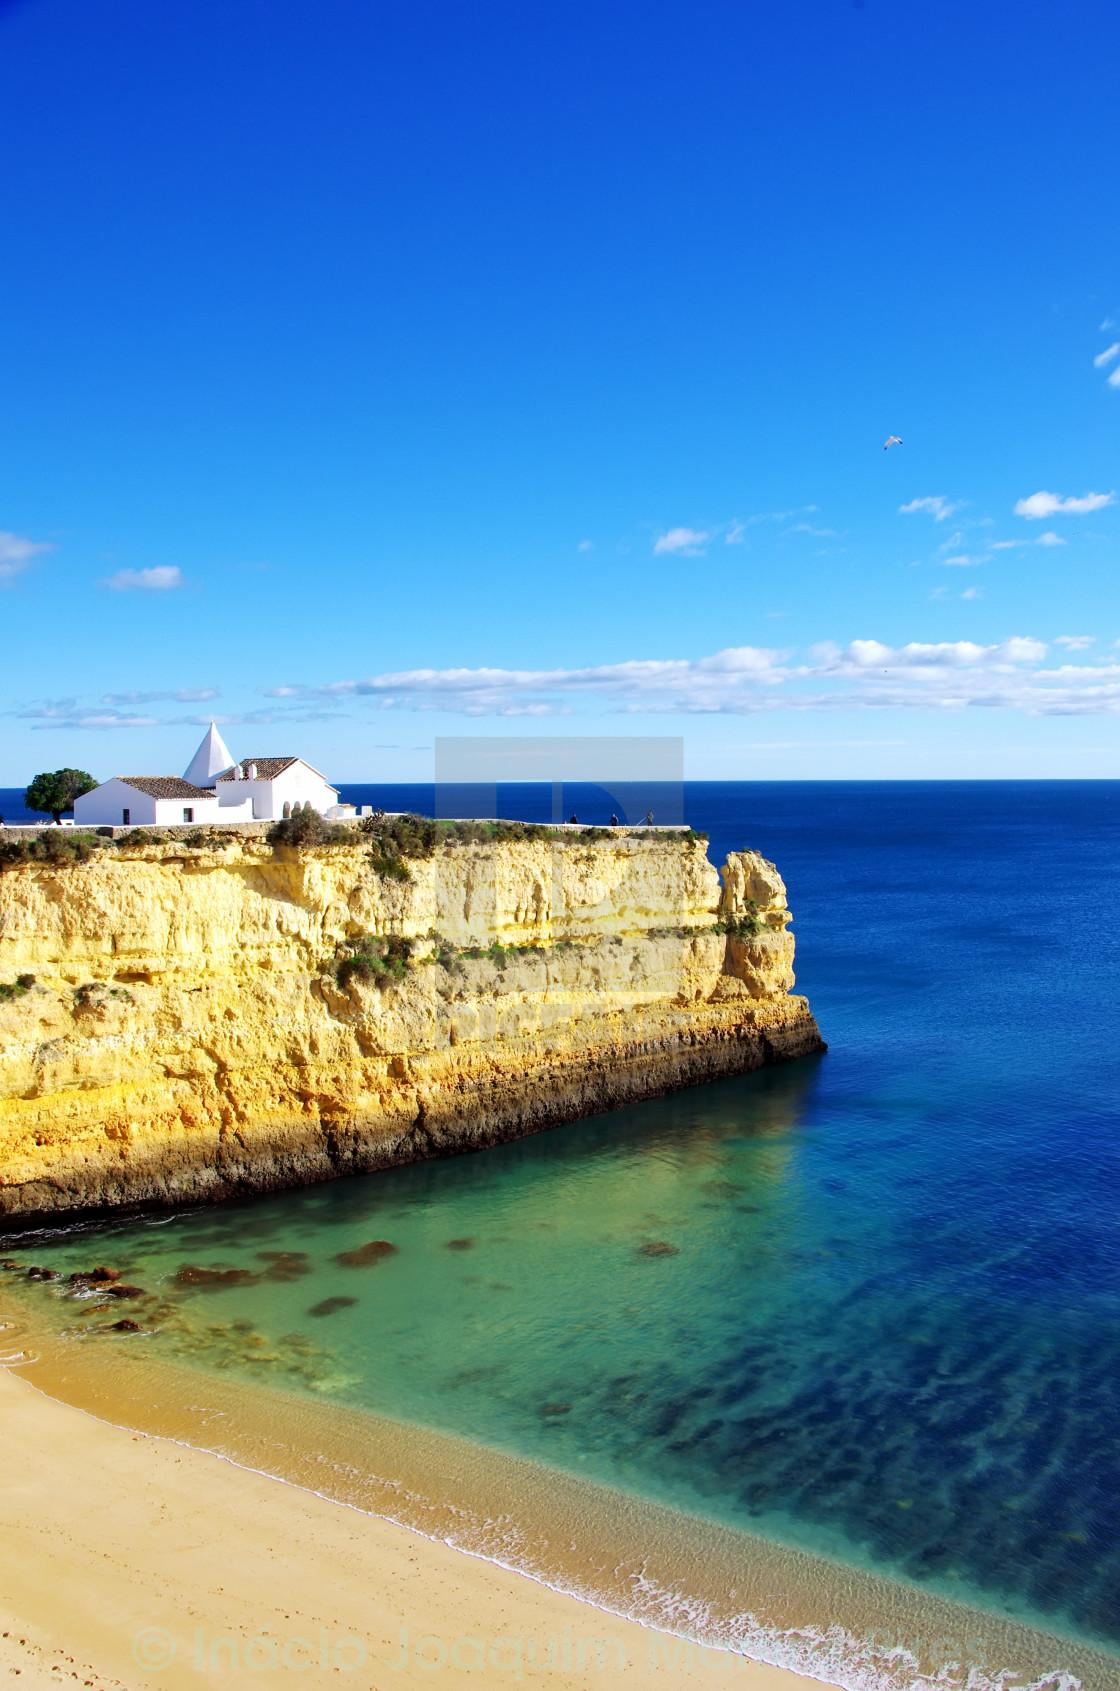 """senhora da rocha beach, Algarve, Portugal"" stock image"